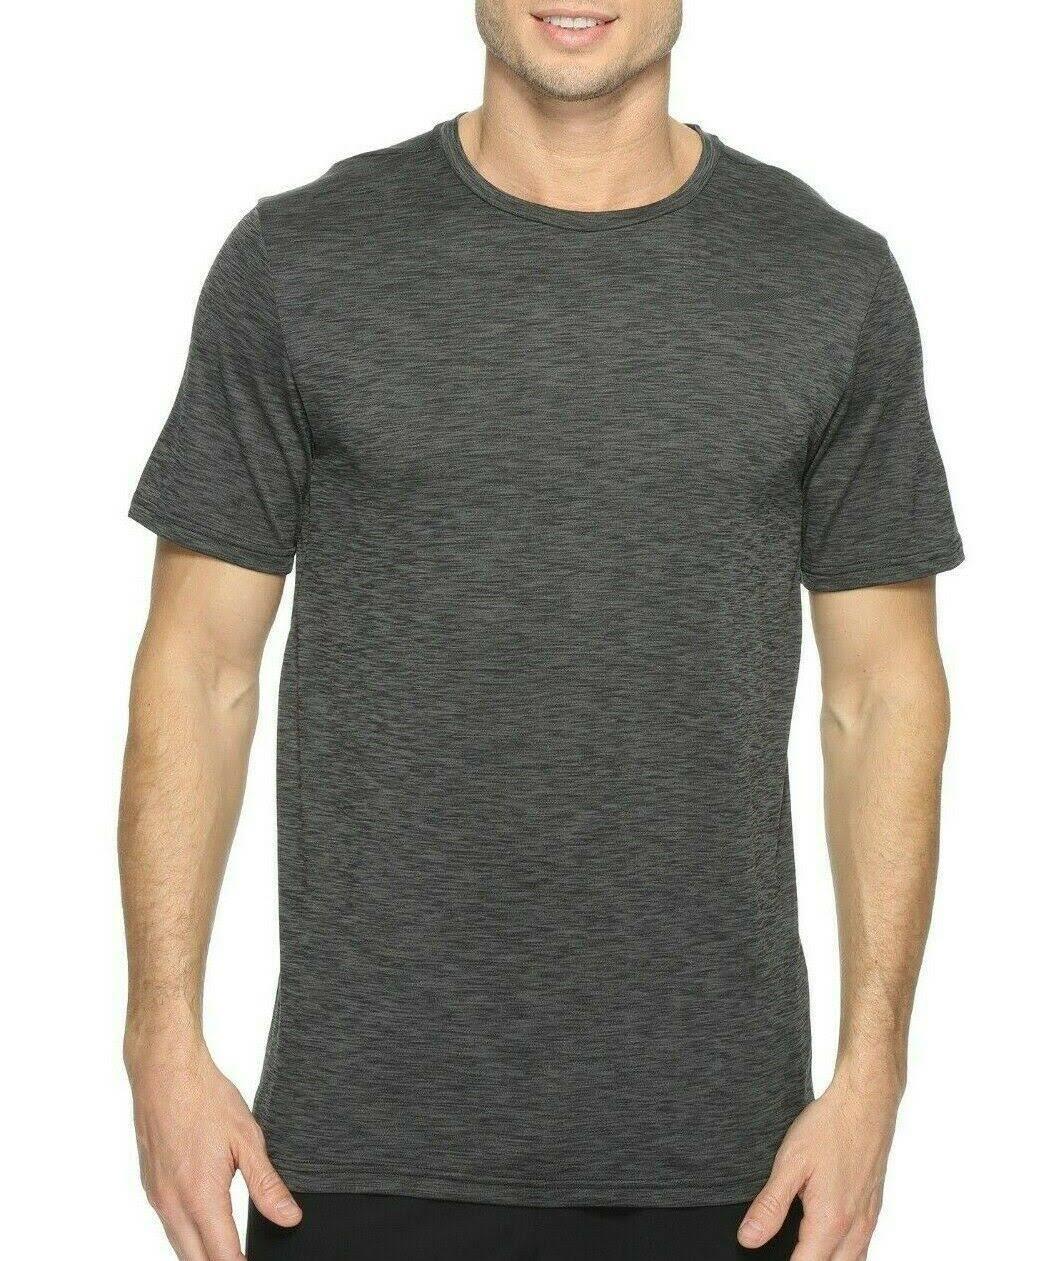 Camiseta Nike 832835010 Corta Entrenamiento Dry Hyper Manga Hombre Breathe De rfqI4wr